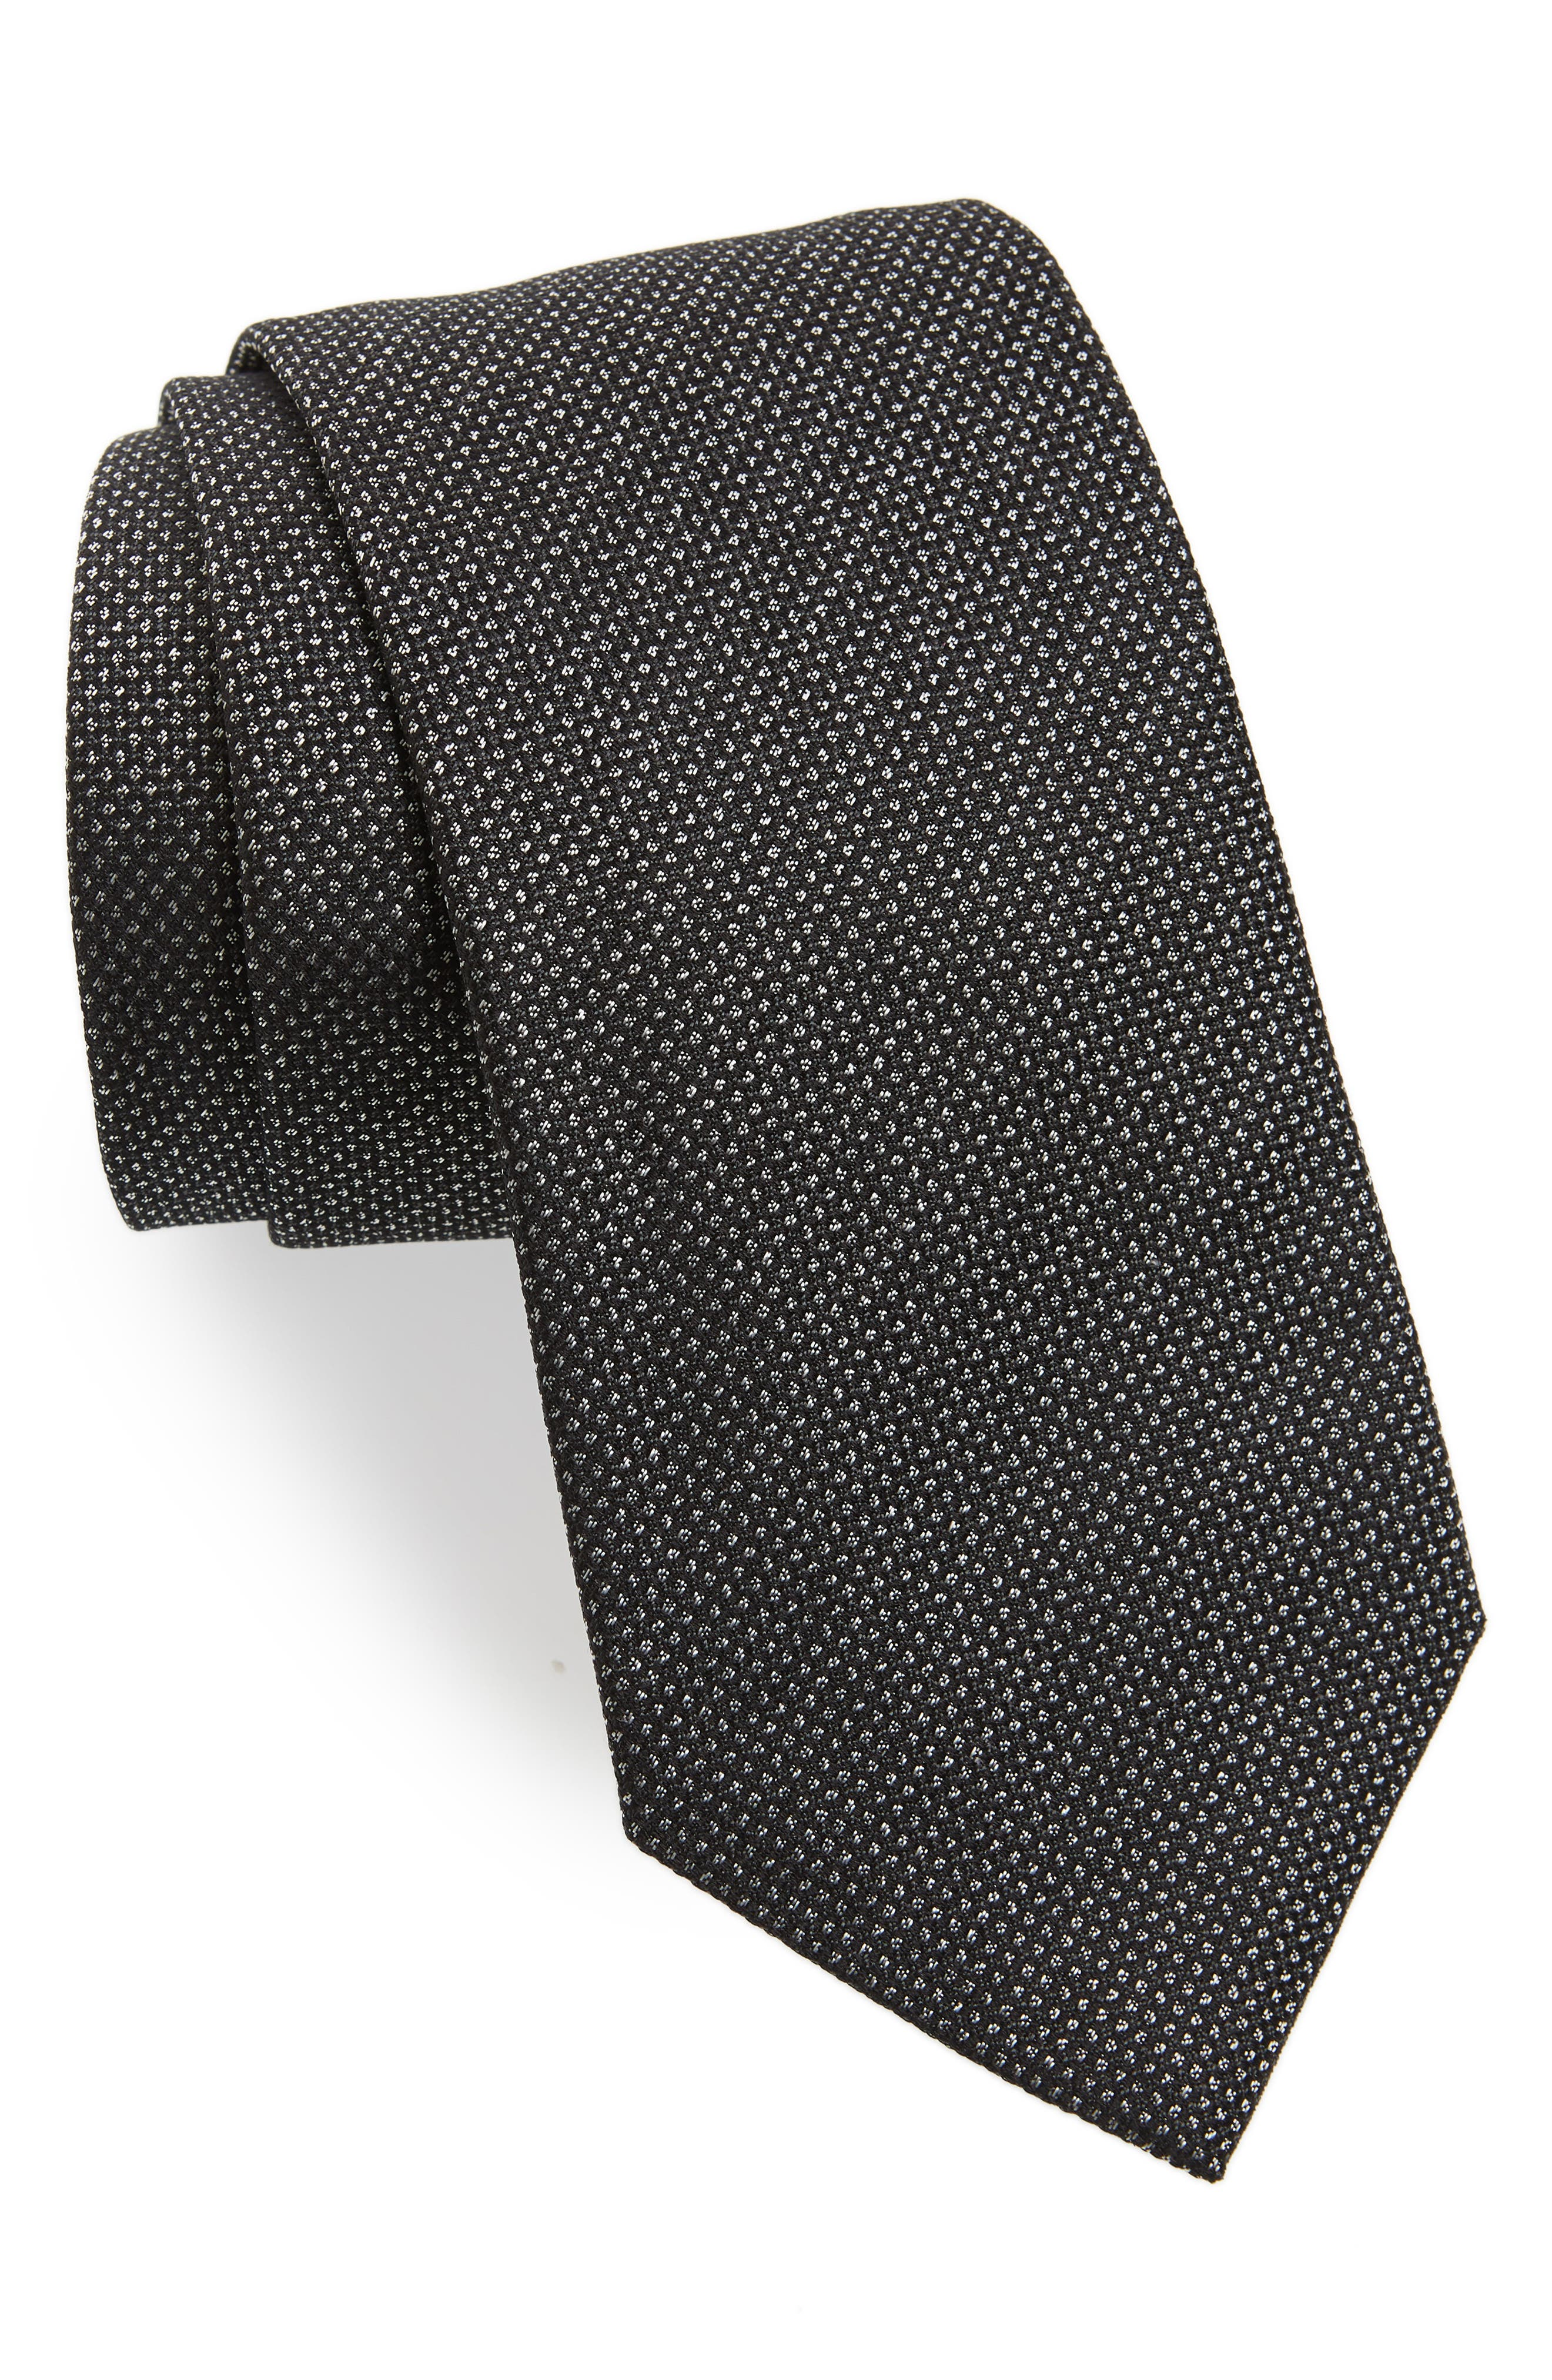 Dot Silk Tie,                             Main thumbnail 1, color,                             001